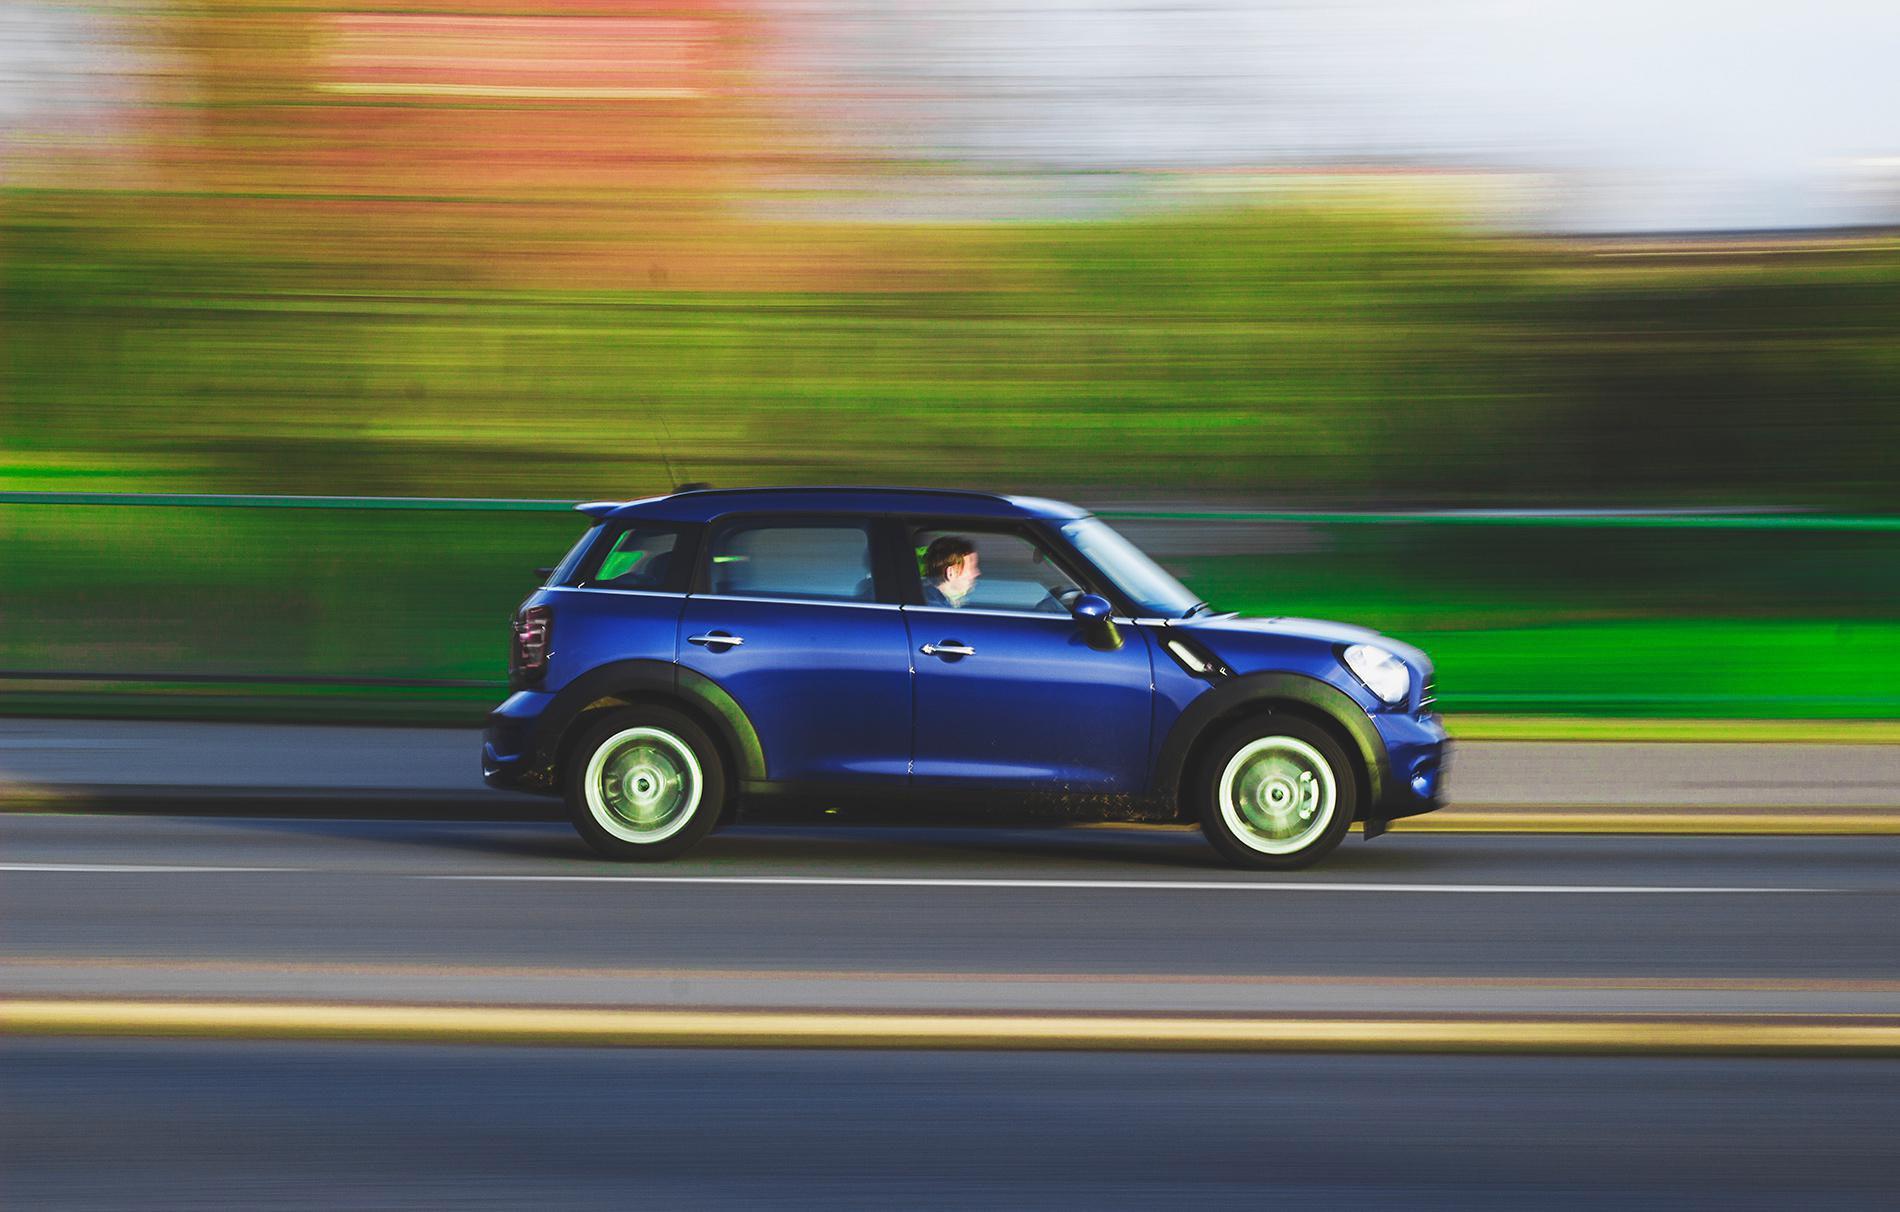 road-car-fast-speed-20411